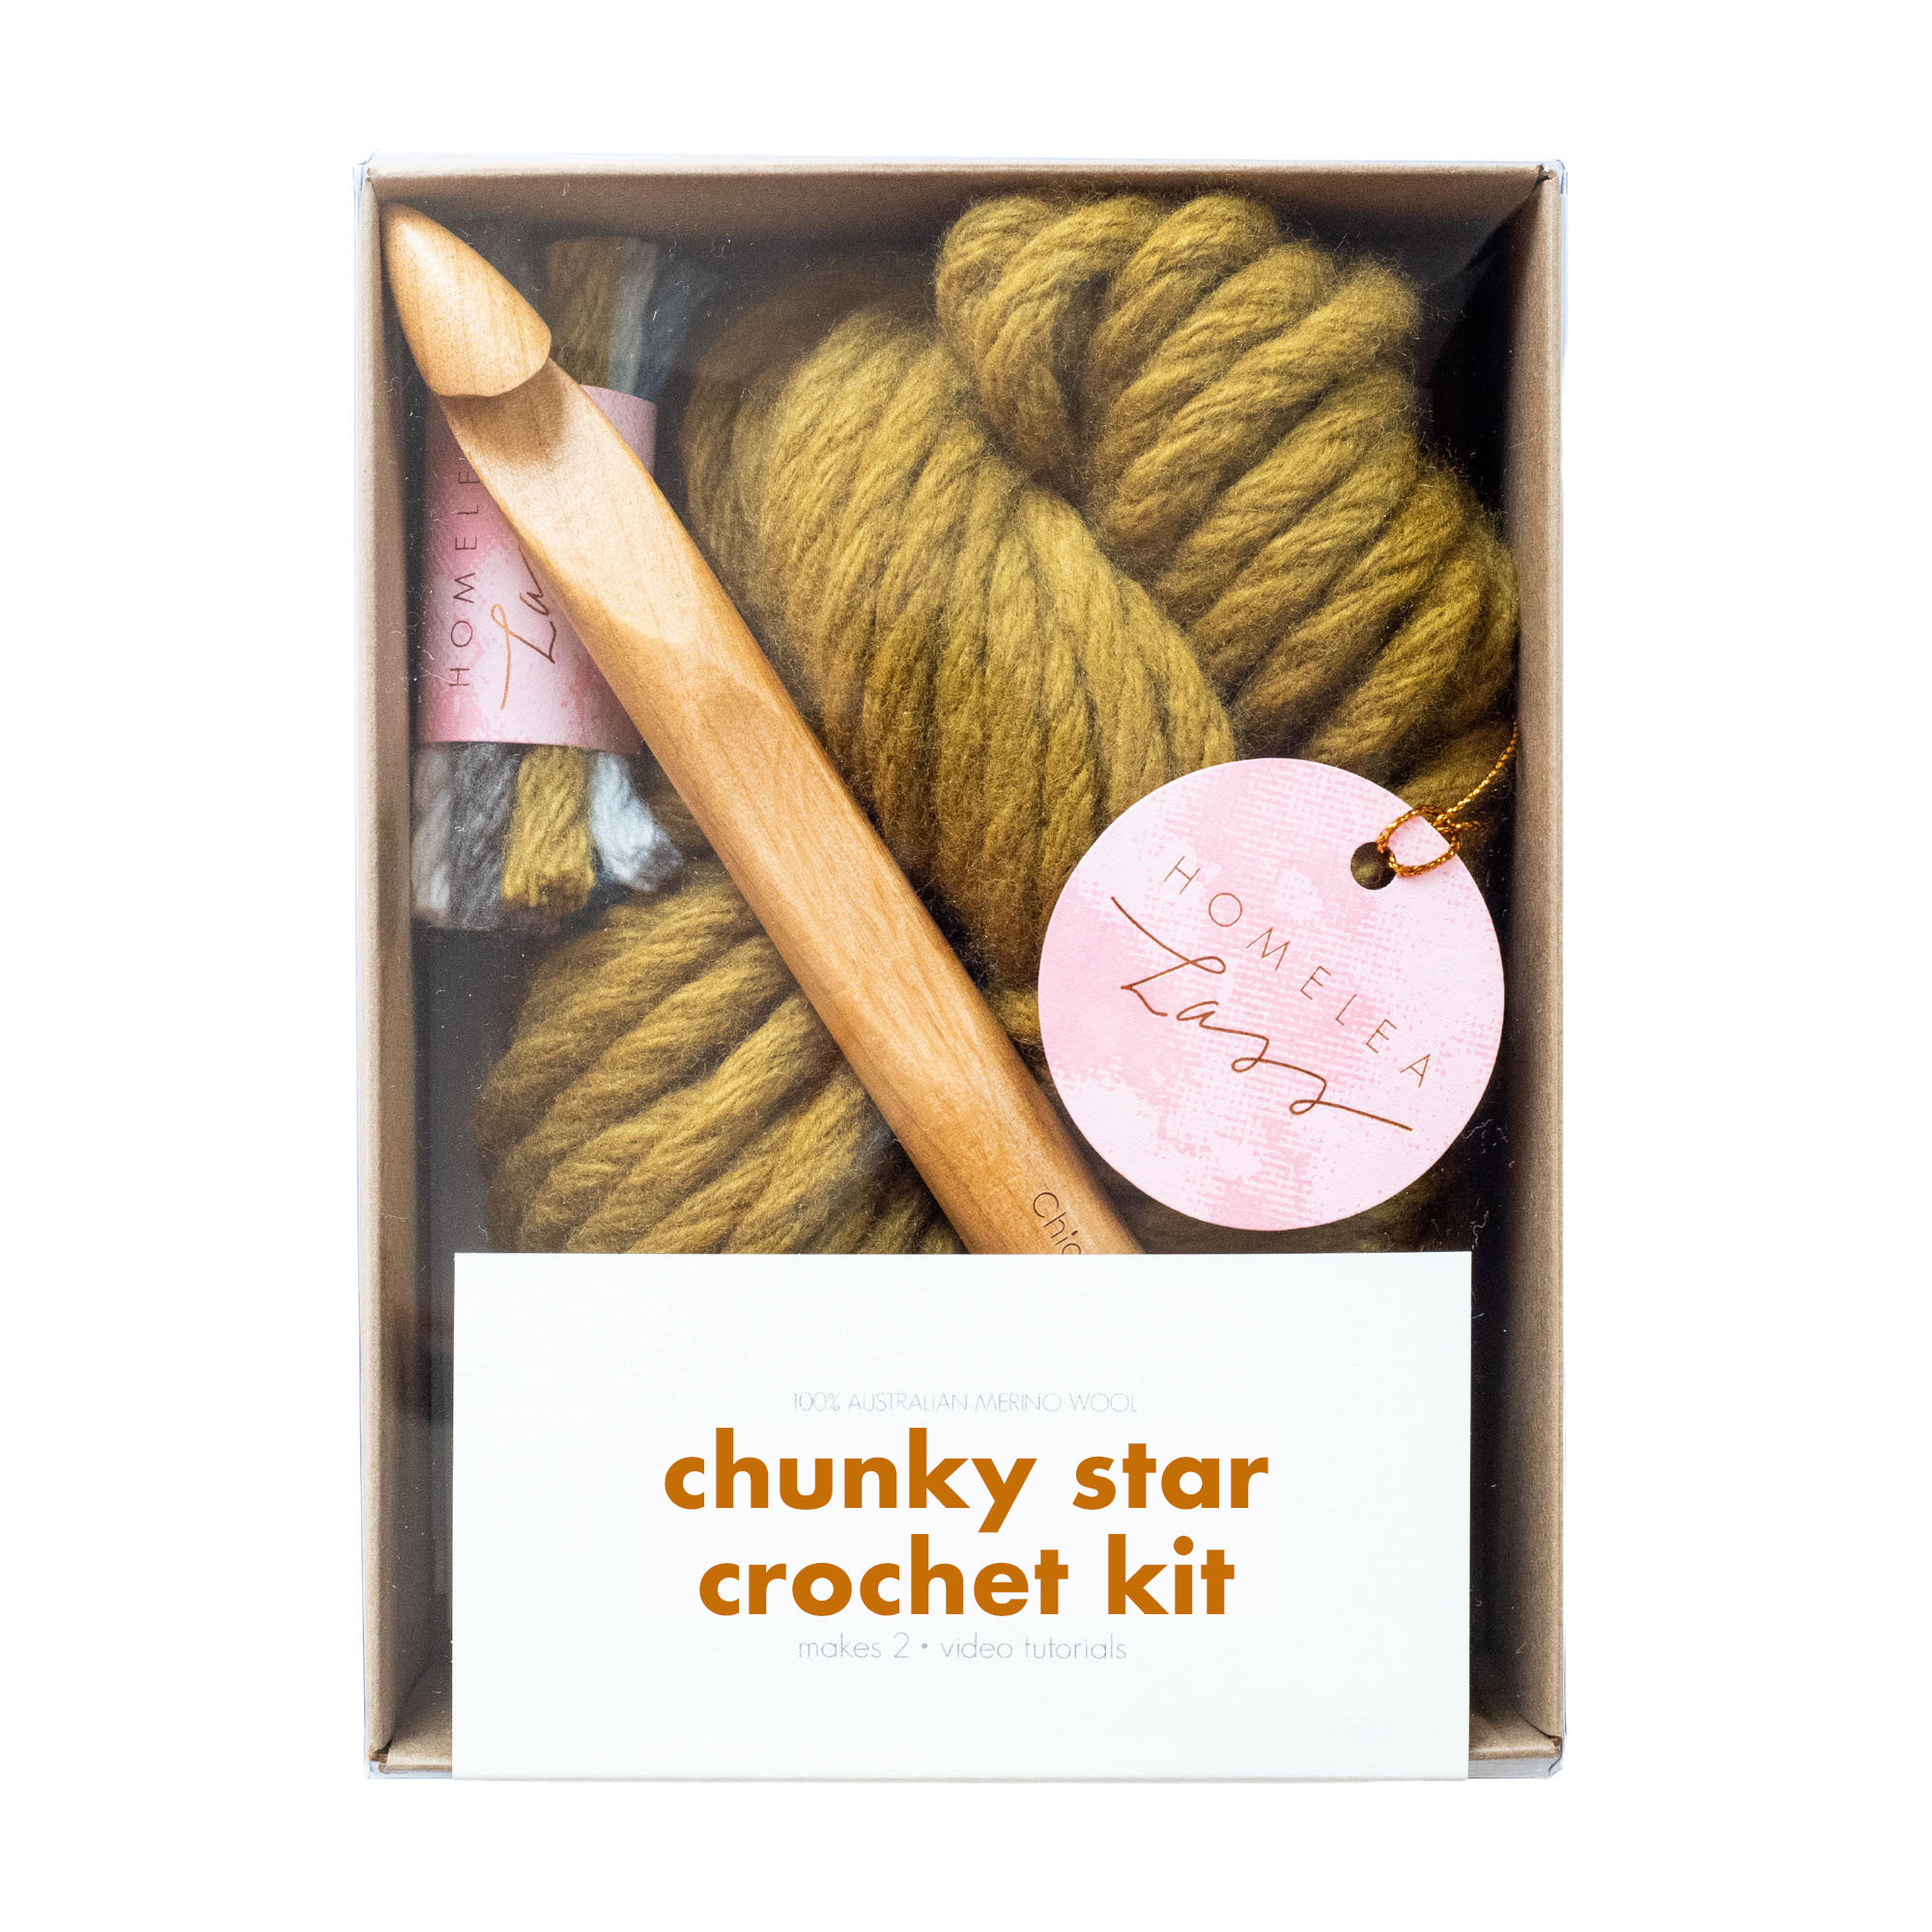 Chunky Star Crochet Kit | Homelea Lass Contemporary Crochet